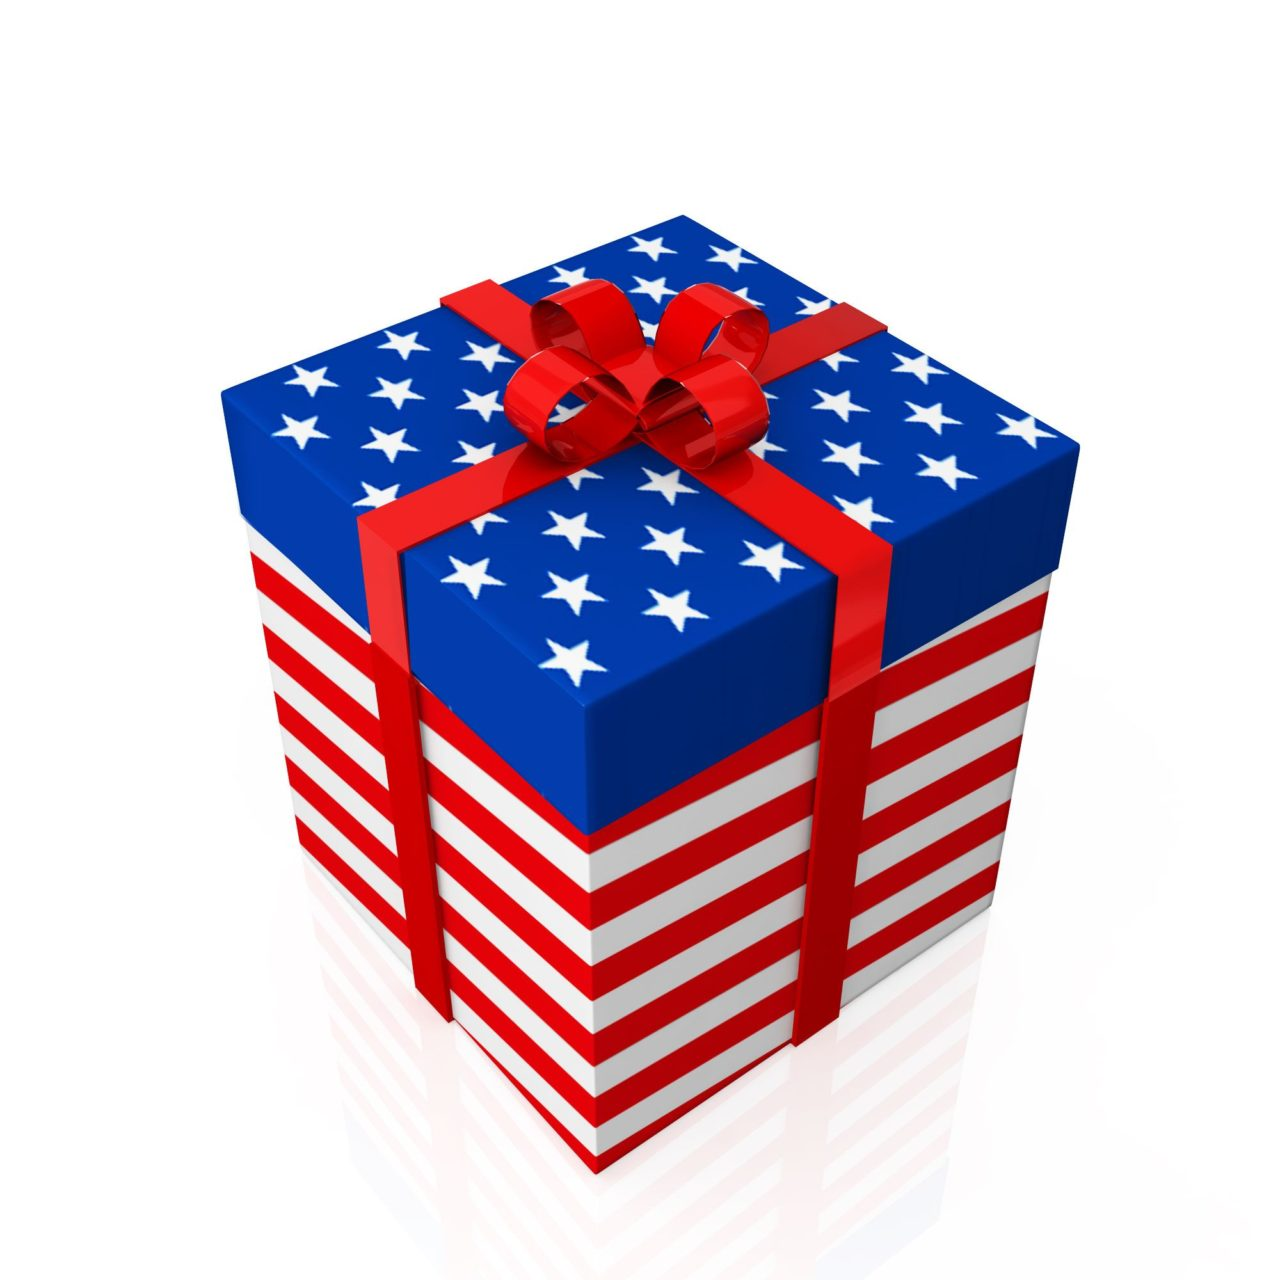 https://yep-training.com/wp-content/uploads/2020/09/american_flag_design_gift_box_stock_photo_Slide01-1280x1280.jpg